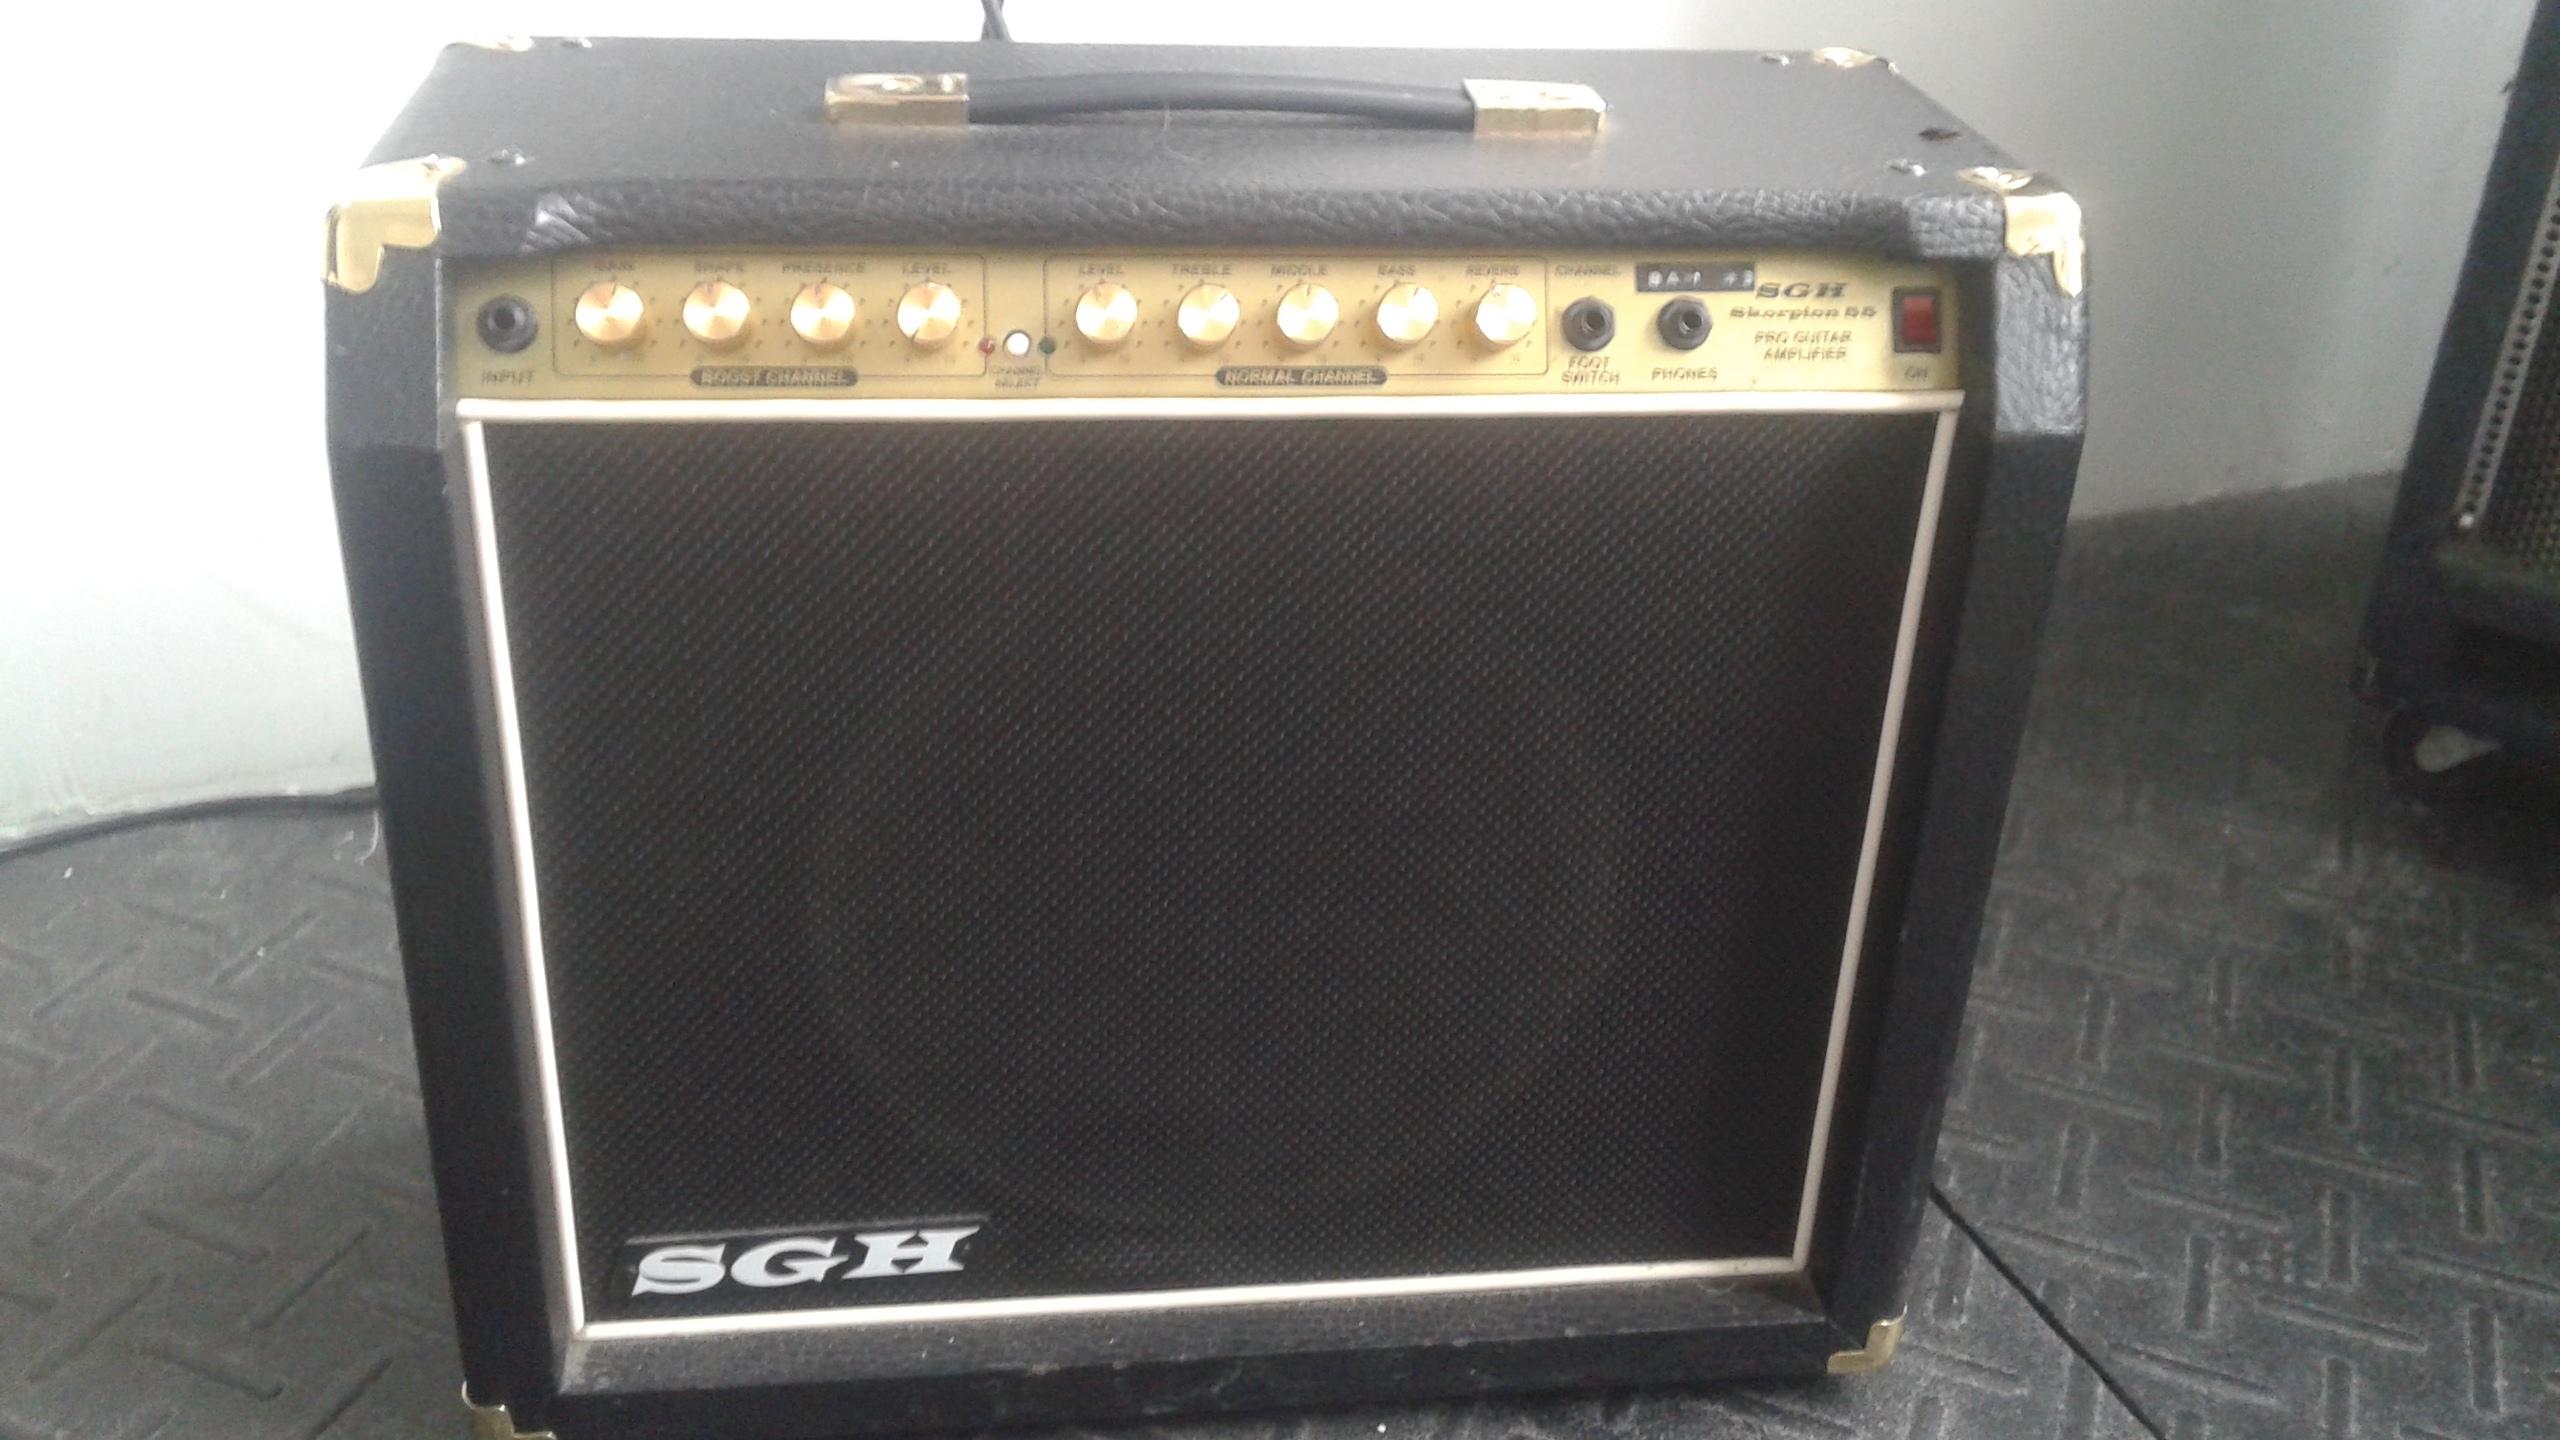 SGH Pro Guitar Amp - Skorpion 55